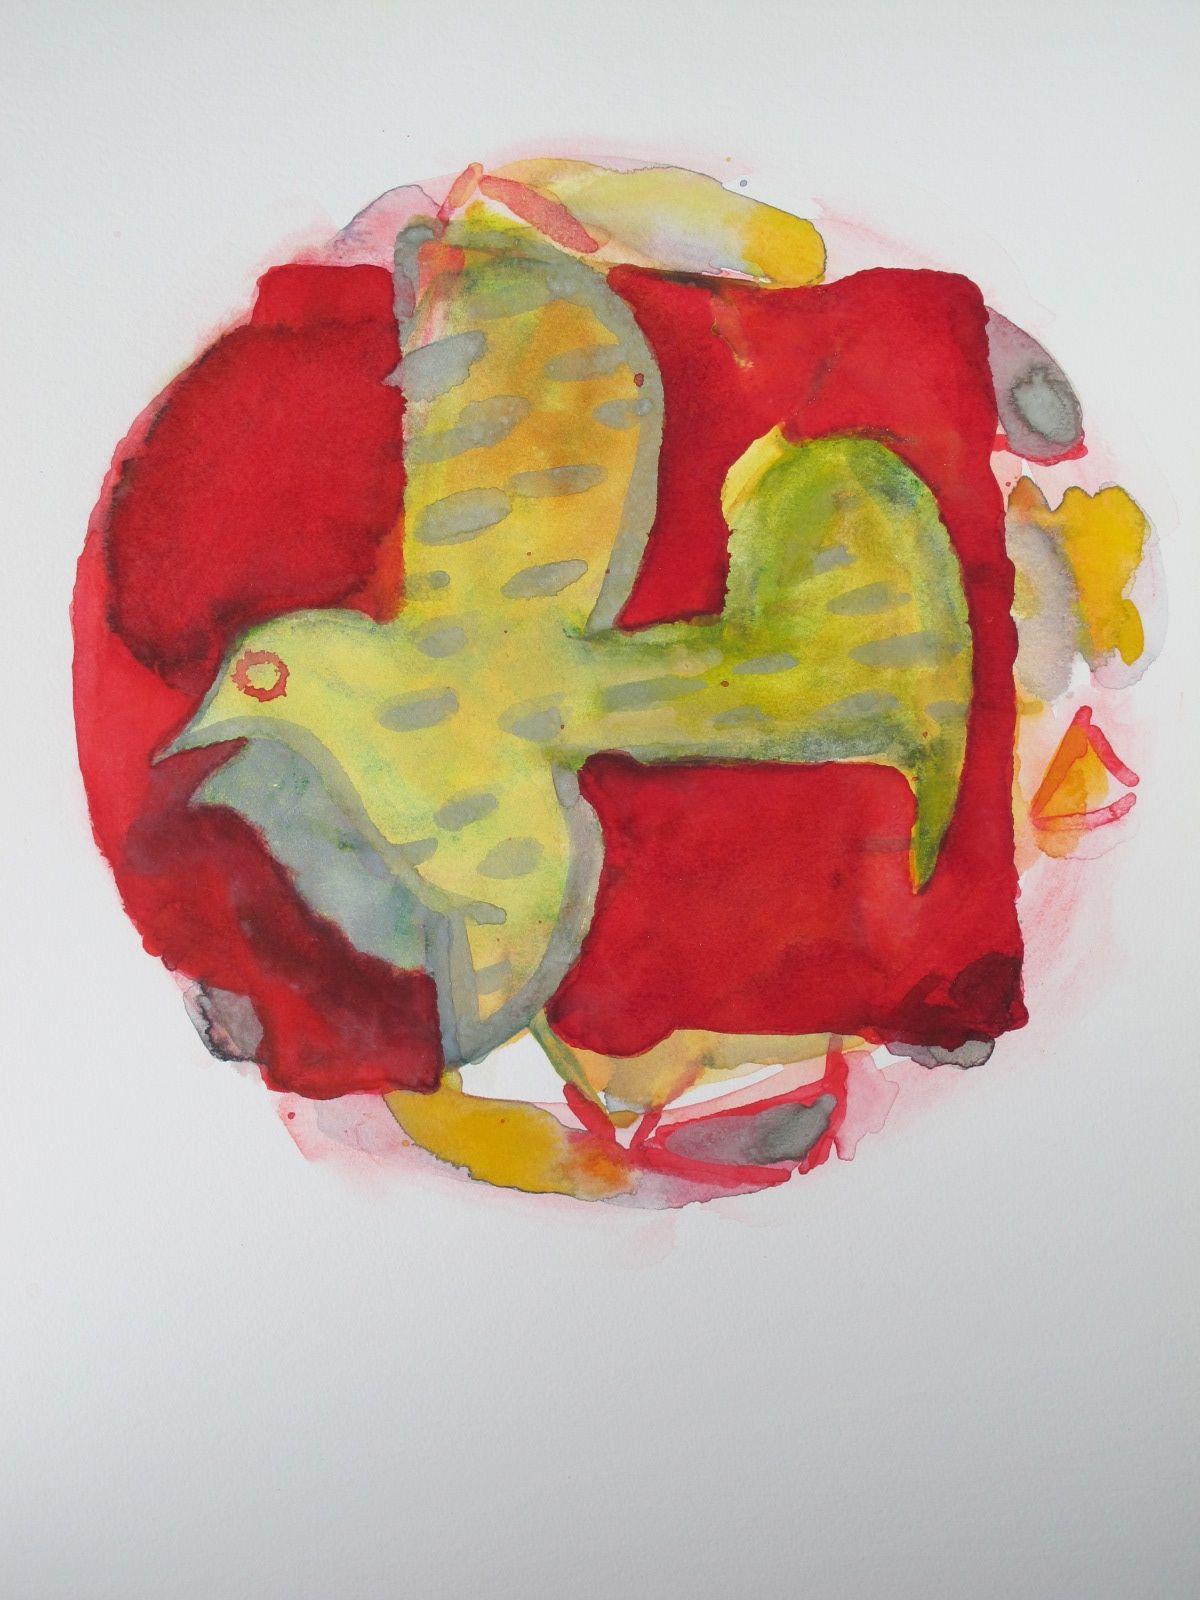 KESTREL  -  watercolor